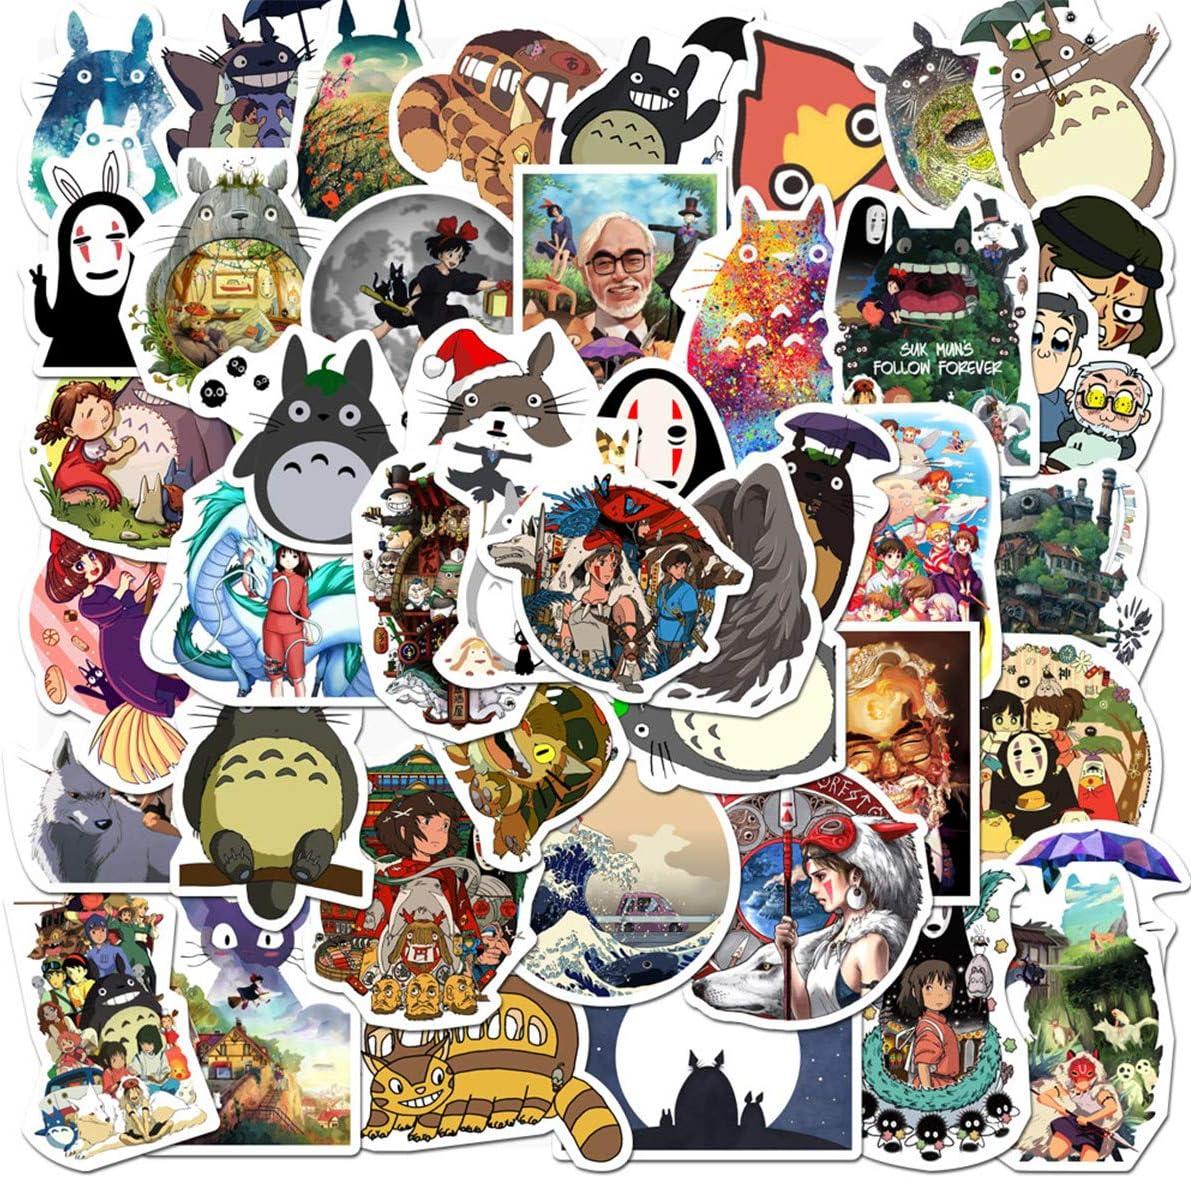 Lovely Totoro Miyazaki Hayao Stickers for Personalize Water Bottle Car Helmet Skateboard Luggage Bike Bumper Notebook Laptop Waterproof Graffiti Decals, Best Gift for Kids (Miyazaki Hayao)